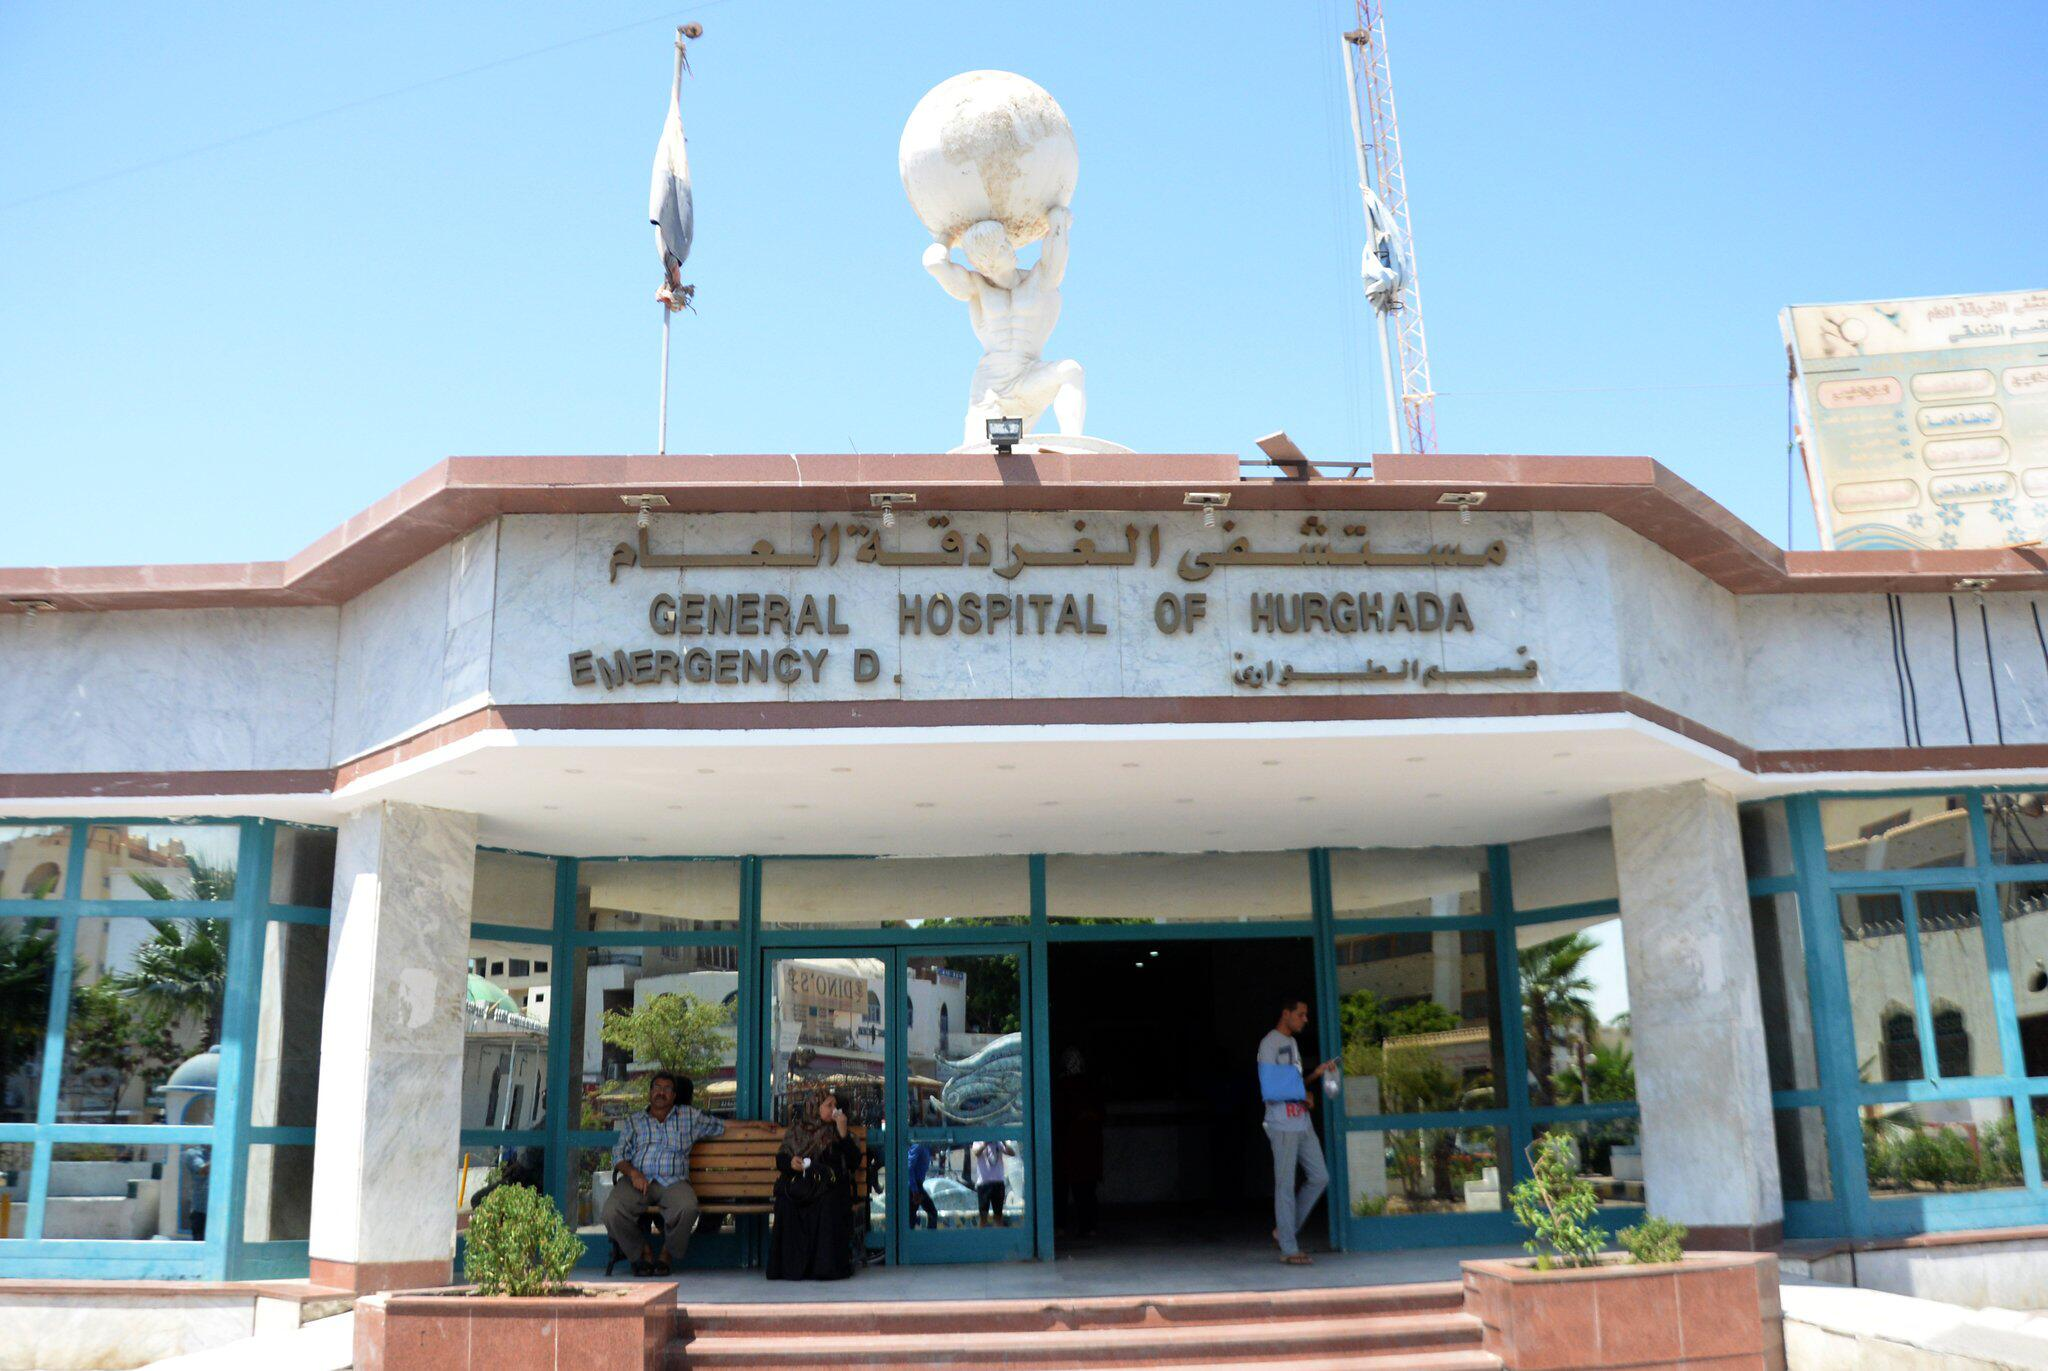 Bild zu Coronavirus - Deutscher Staatsbürger in Ägypten gestorben